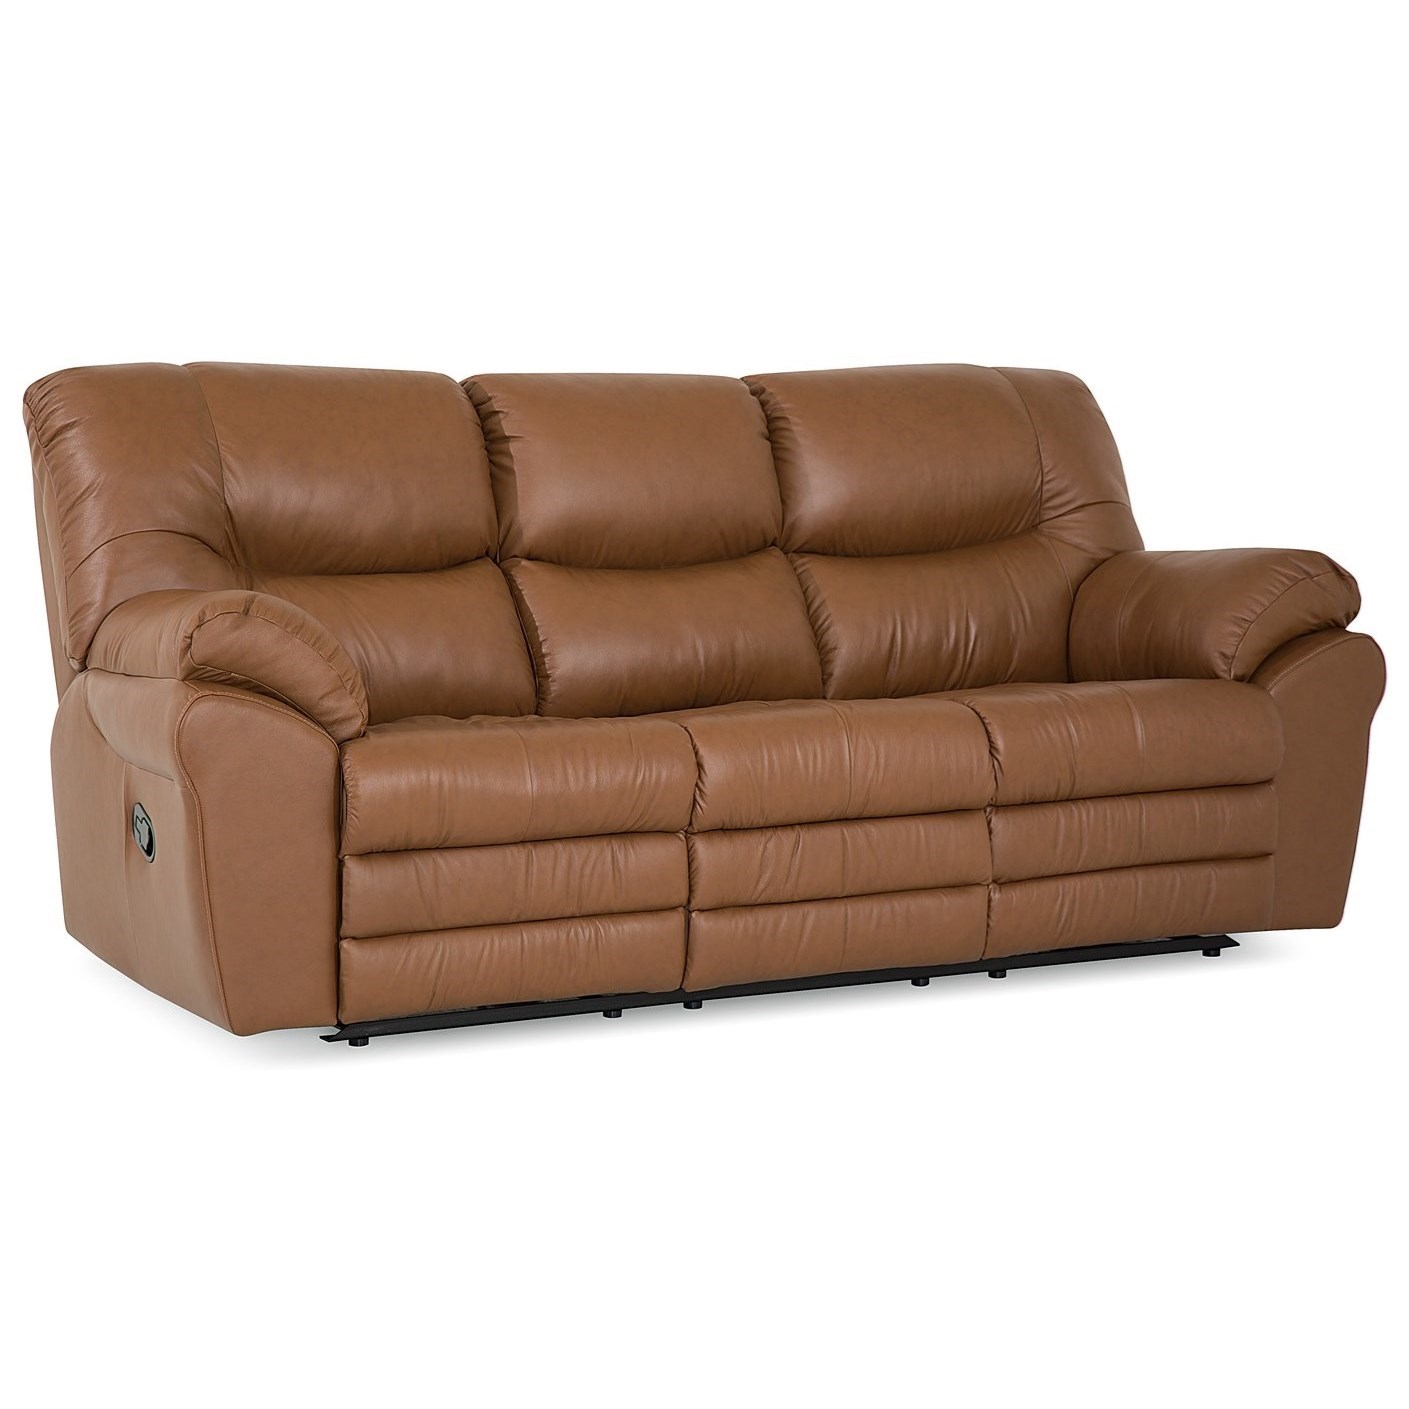 Palliser Divo Casual Power Reclining Sofa A1 Furniture